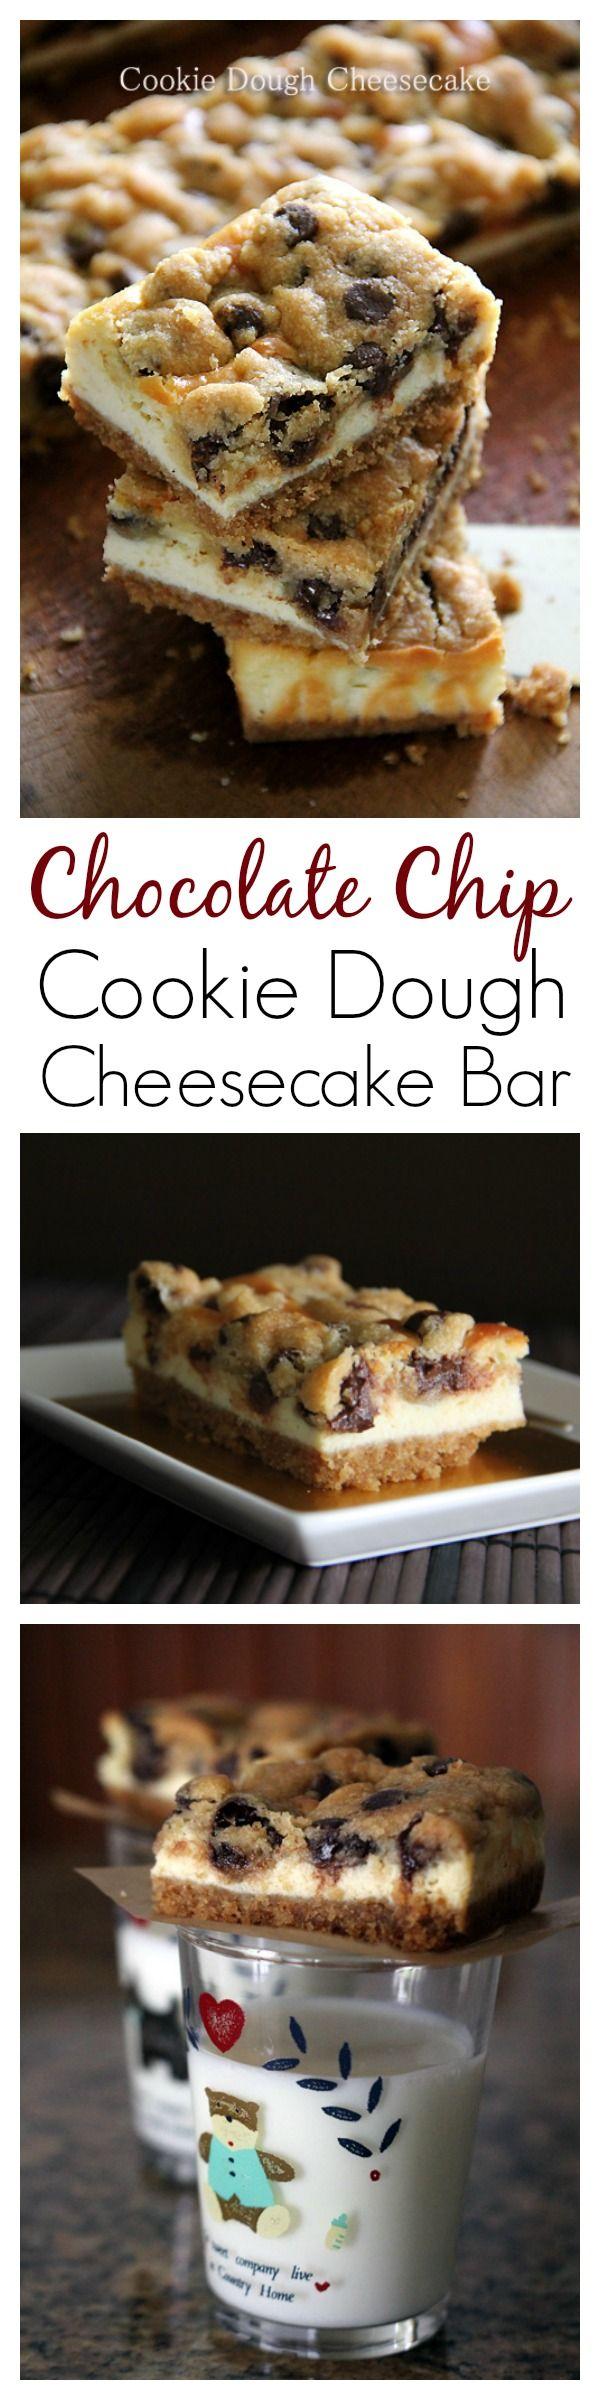 Chocolate Chip Cookie Dough Cheesecake Bar recipe, the BEST cheesecake bar EVER | rasamalaysia.com